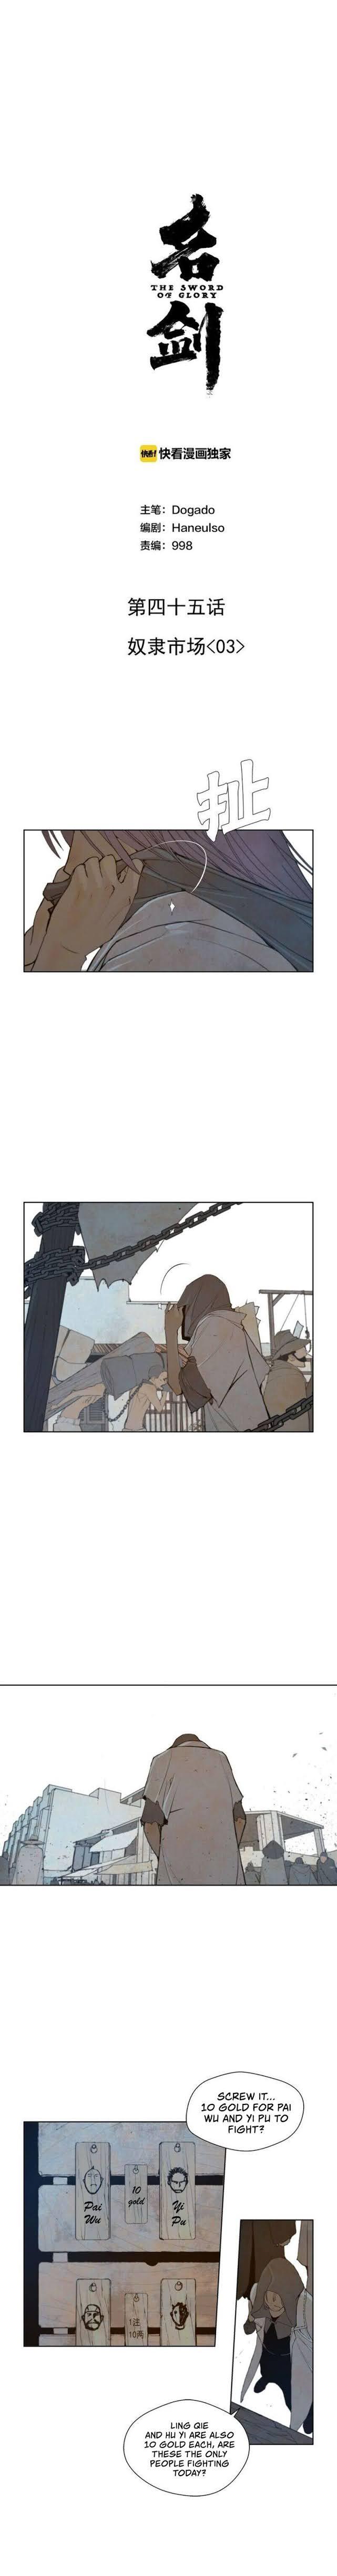 The Sword Of Glory Chapter 45 page 5 - Mangakakalots.com